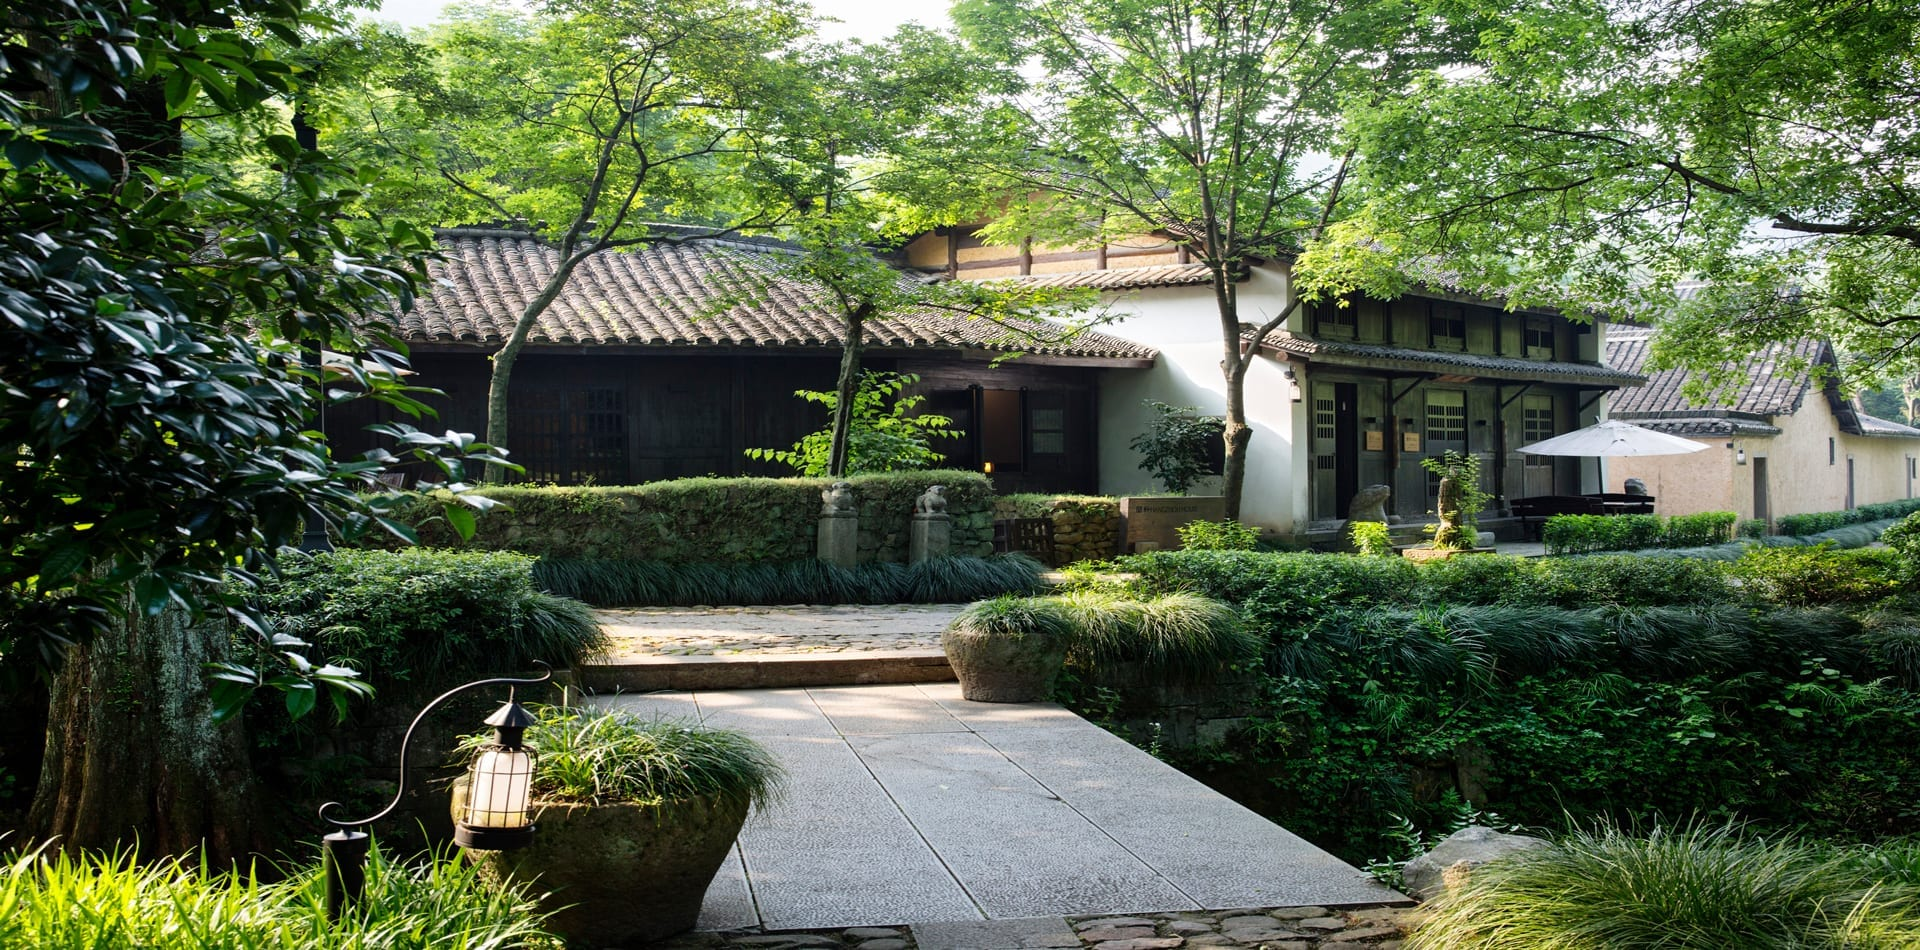 HERO China Amanfayun House